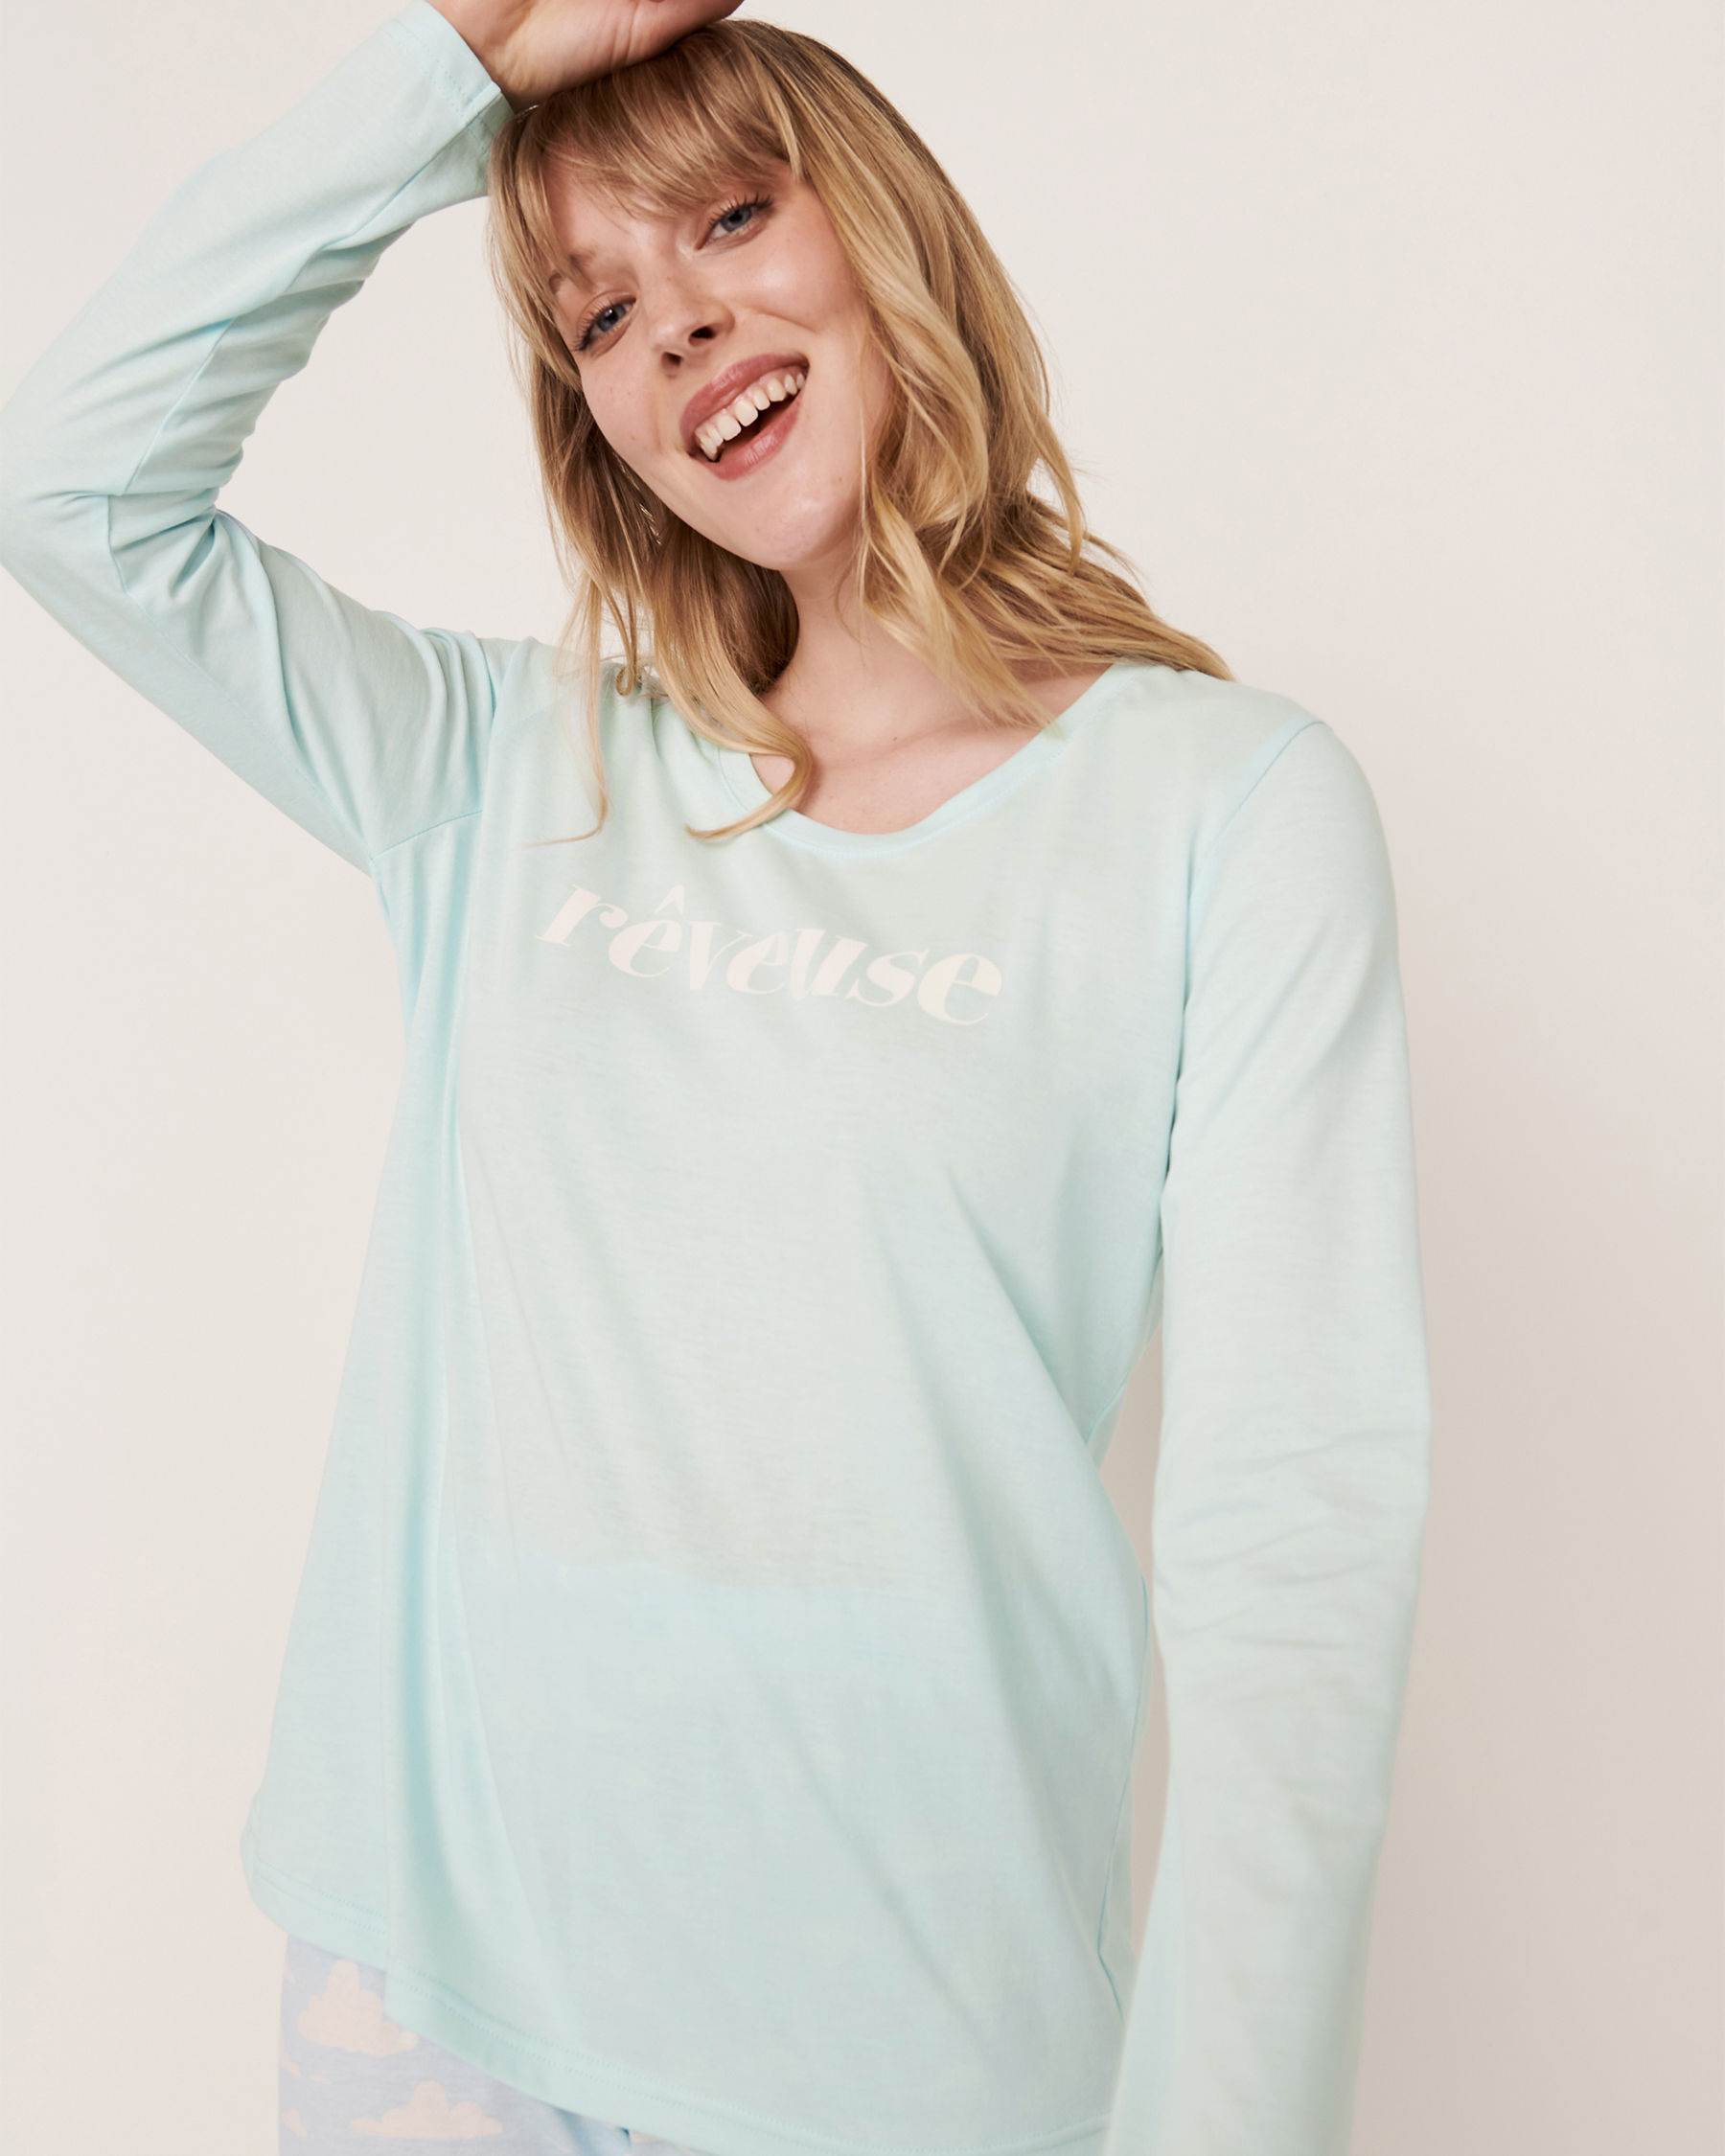 LA VIE EN ROSE Scoop Neck Long Sleeve Shirt Blue glow 40100169 - View1